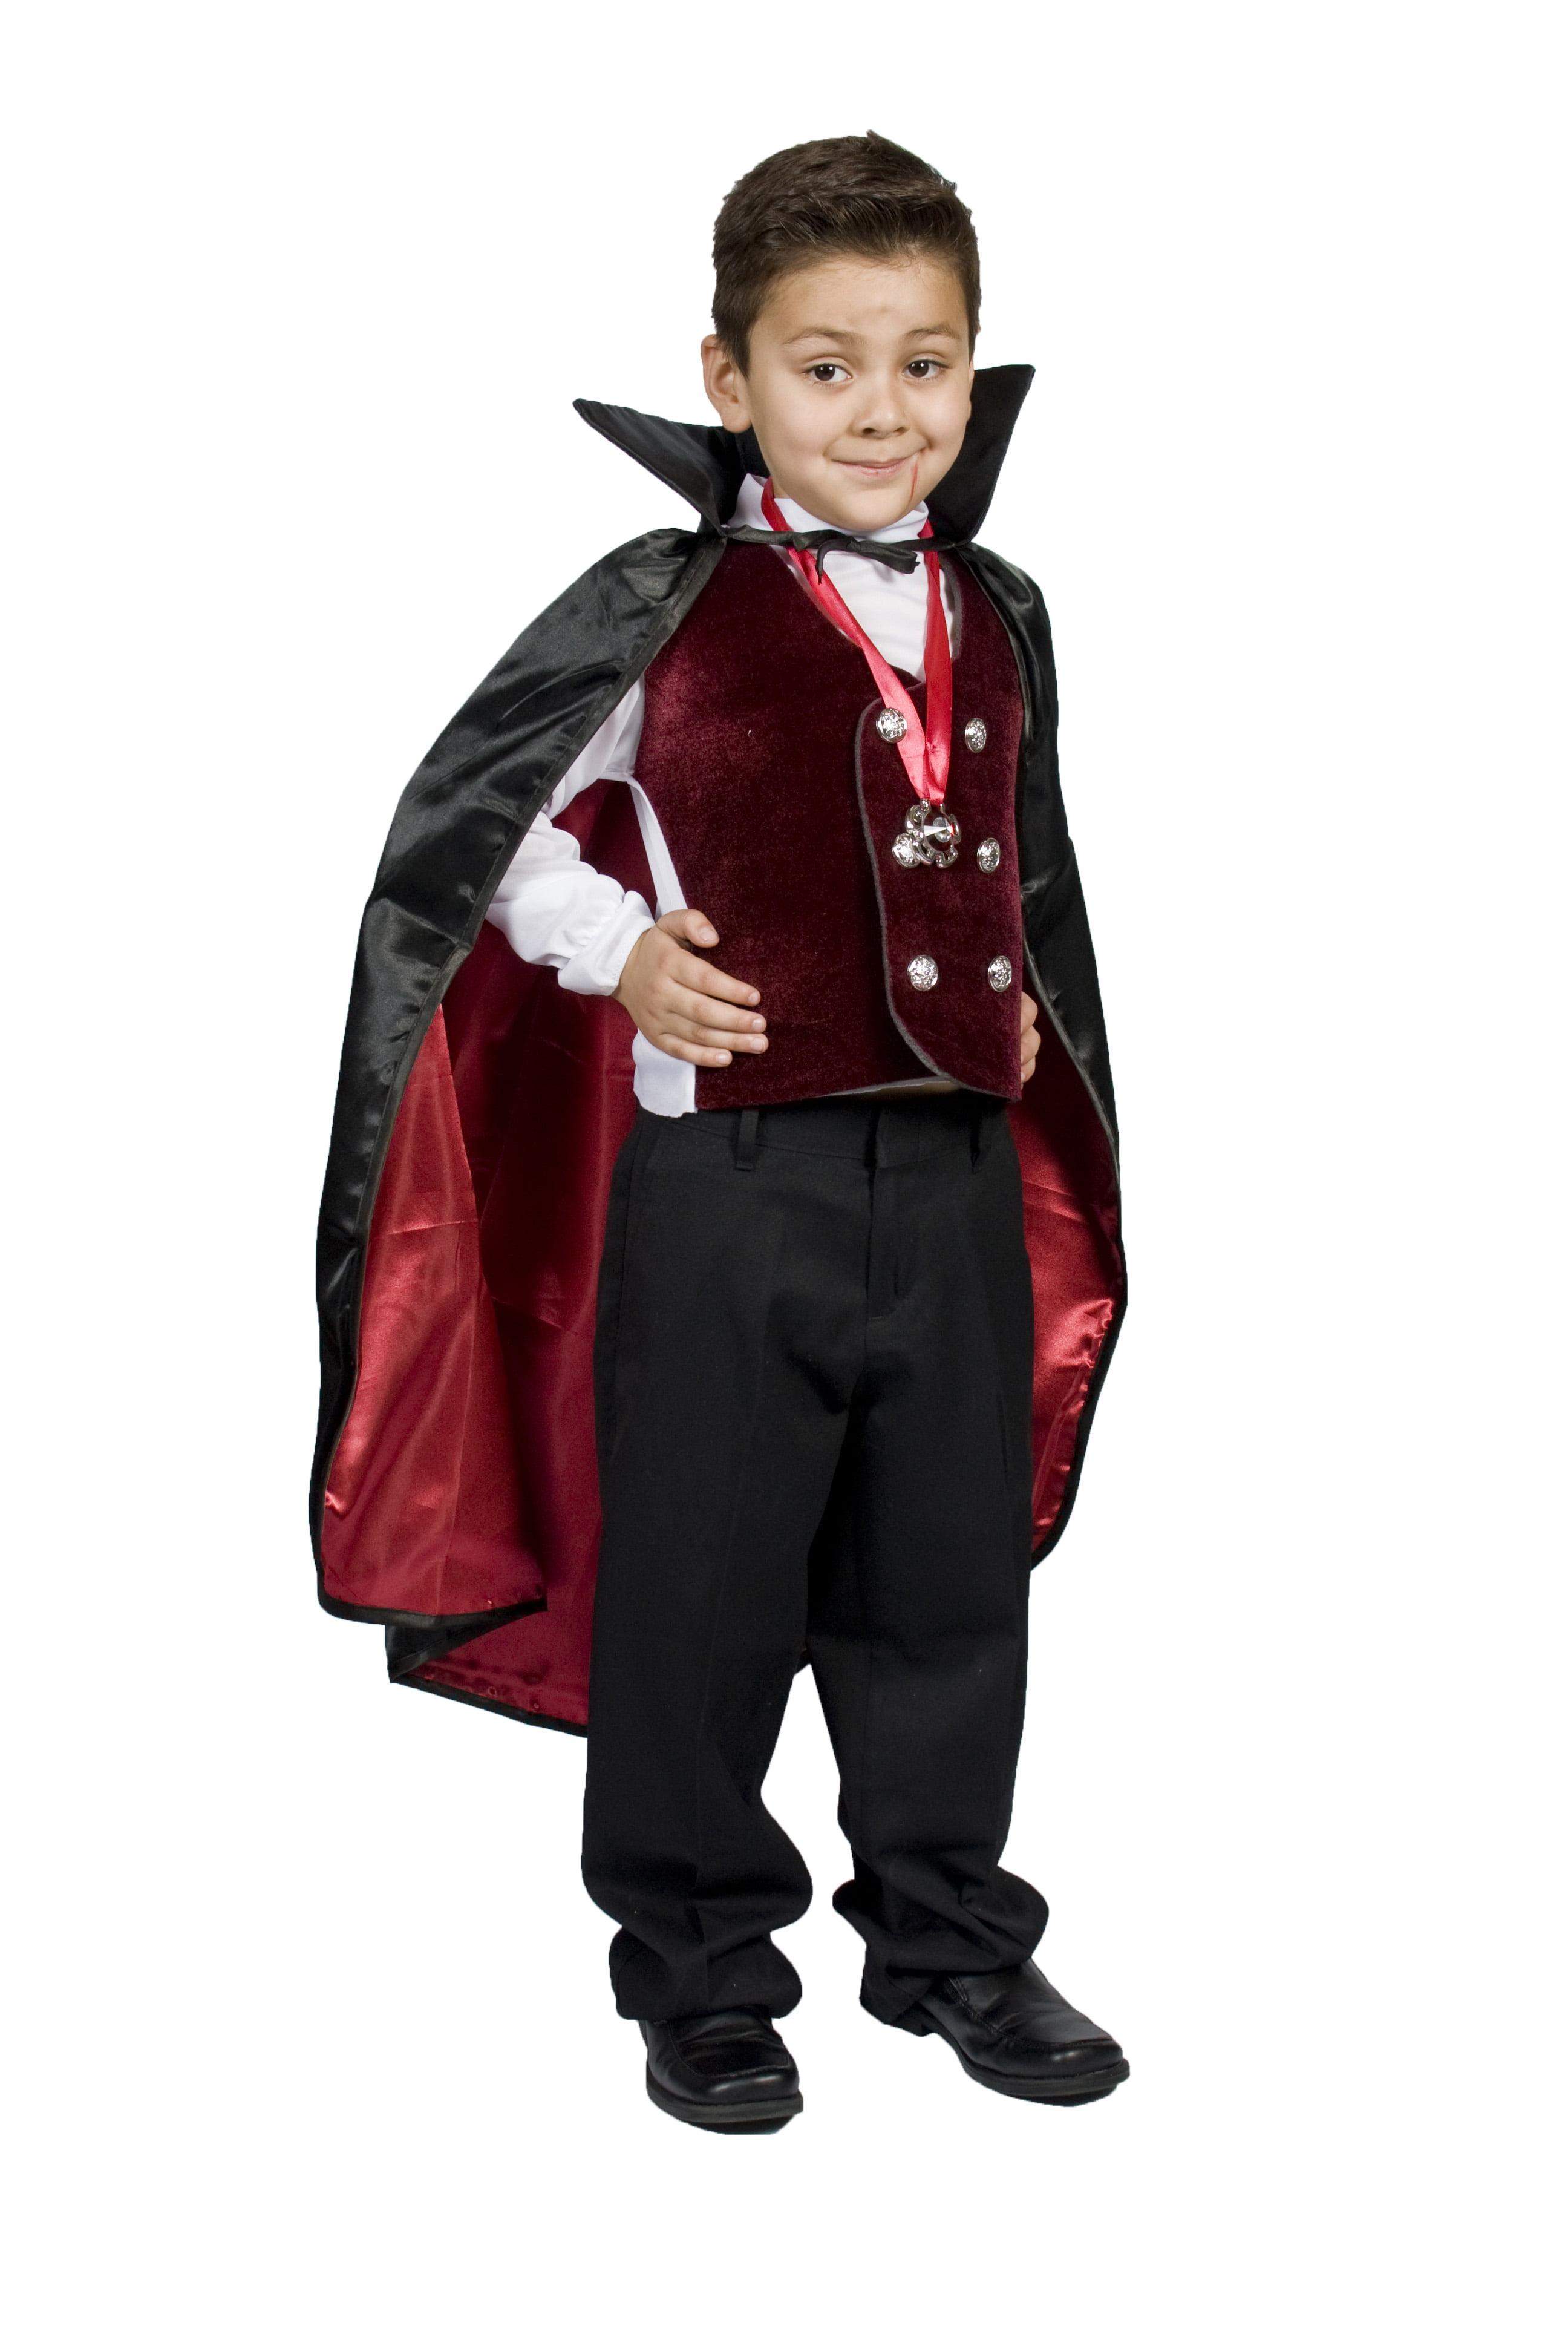 Vampire Halloween Costume, Dracula Boys/Girls Size S 4 5 6 S (4-6) -  Walmart.com